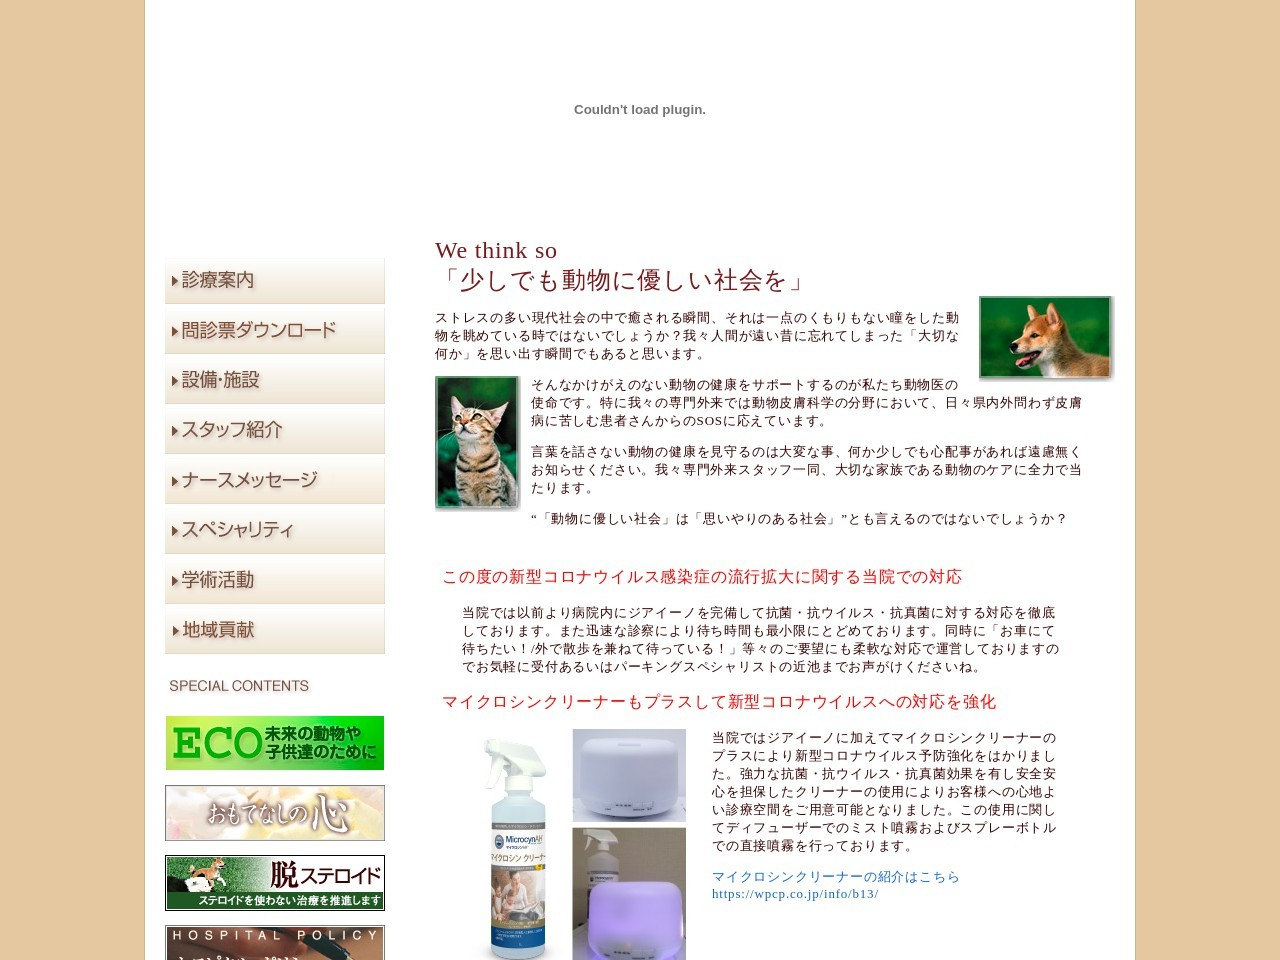 http://www.hashimoto-ac.com